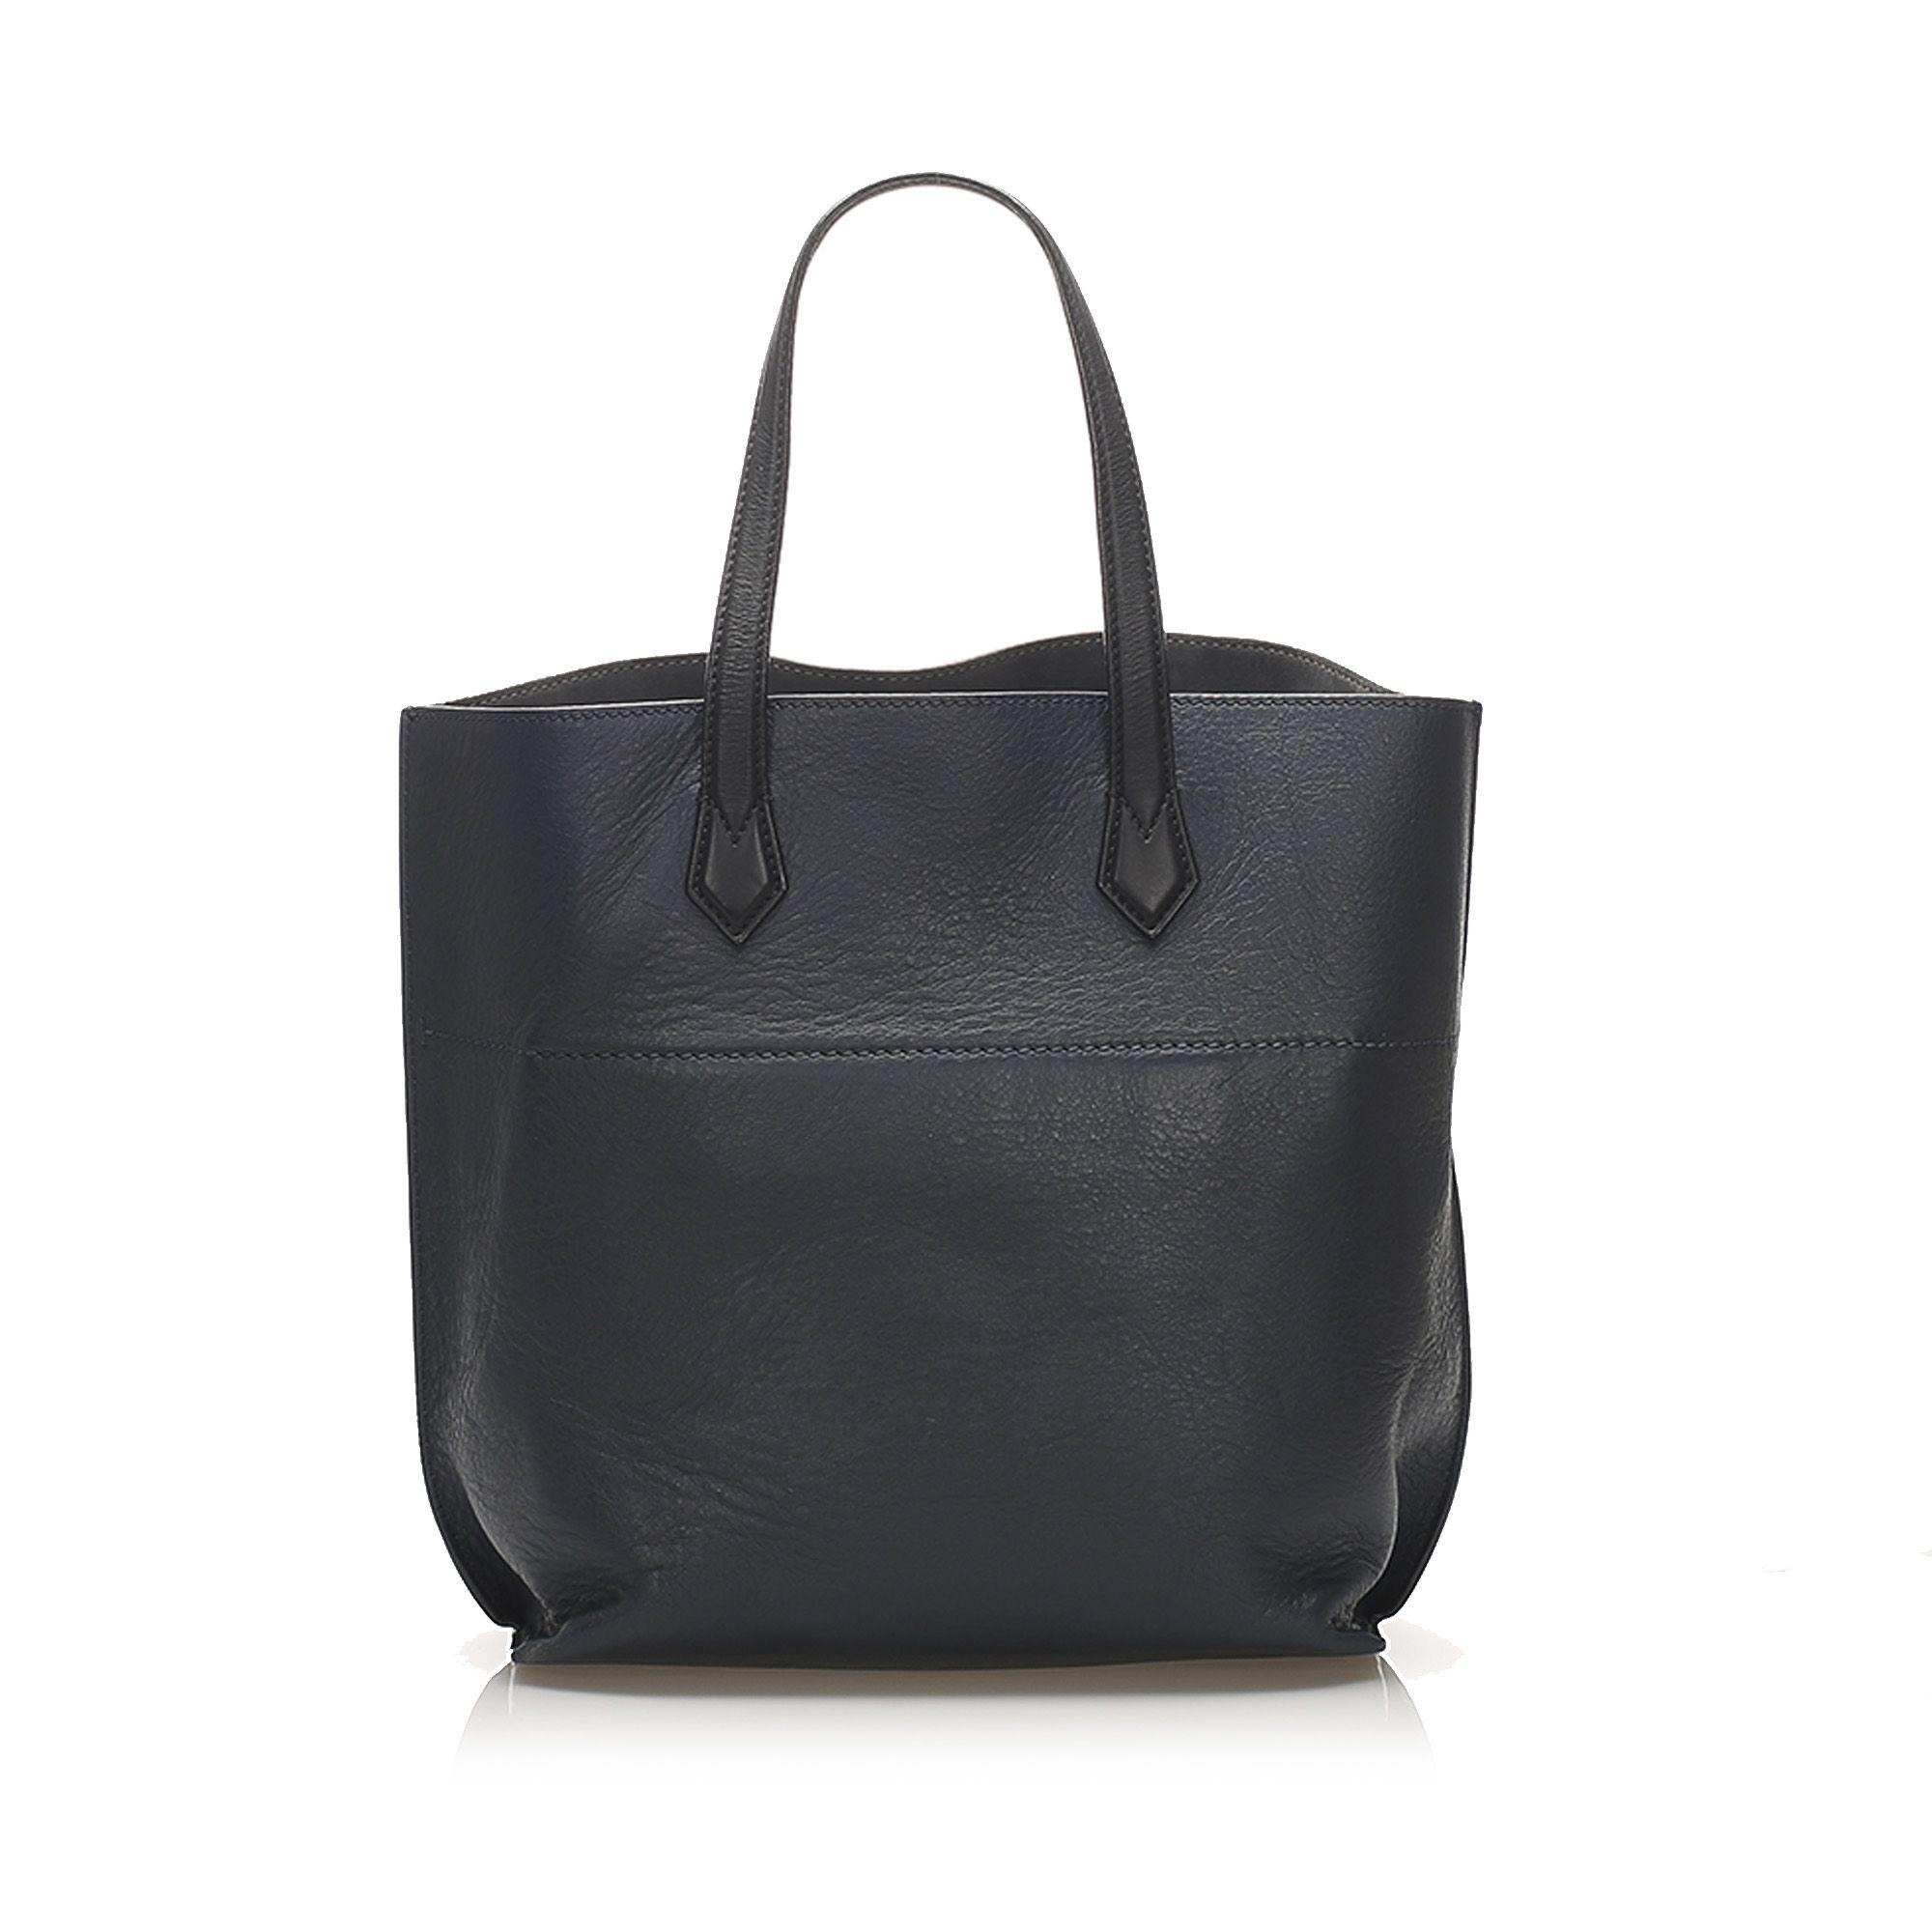 Vintage Fendi All Shopper Leather Tote Blue